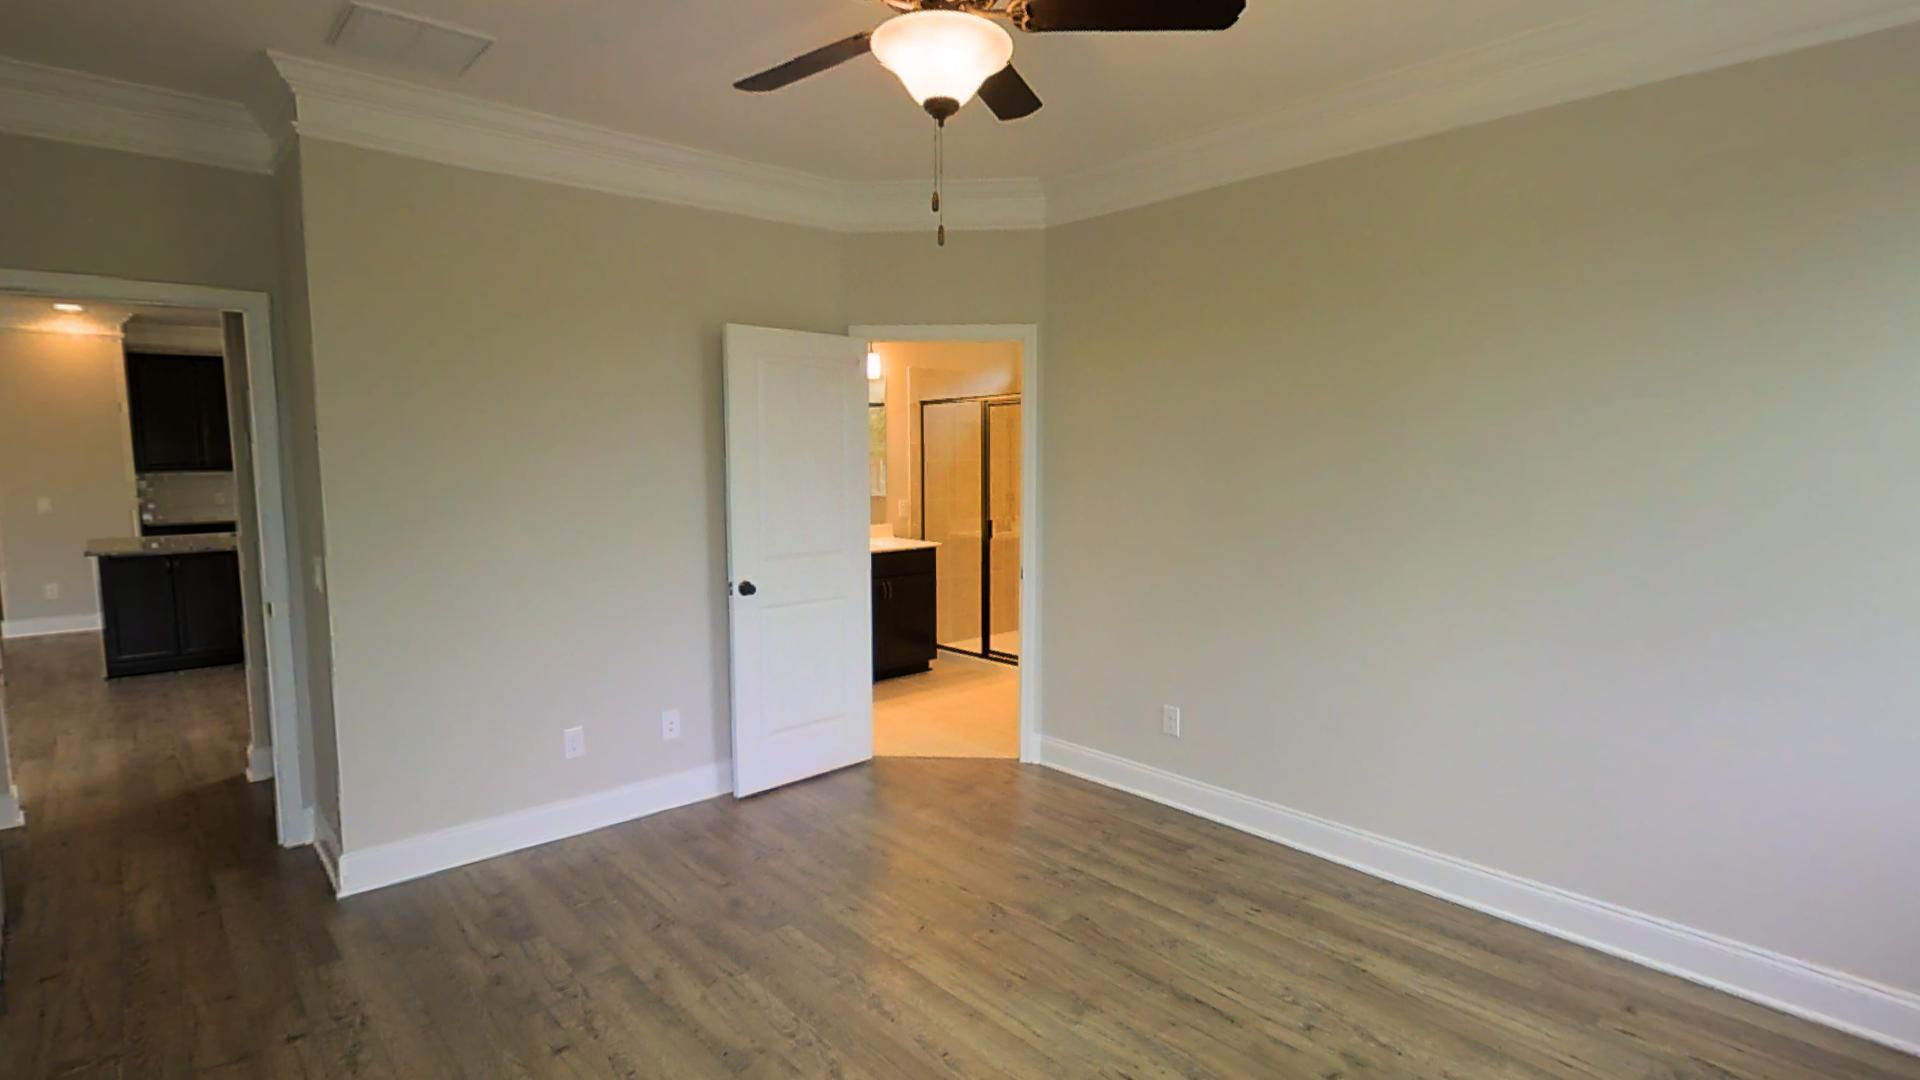 Pinehill Acres Homes For Sale - 129 Schoonover, Summerville, SC - 0